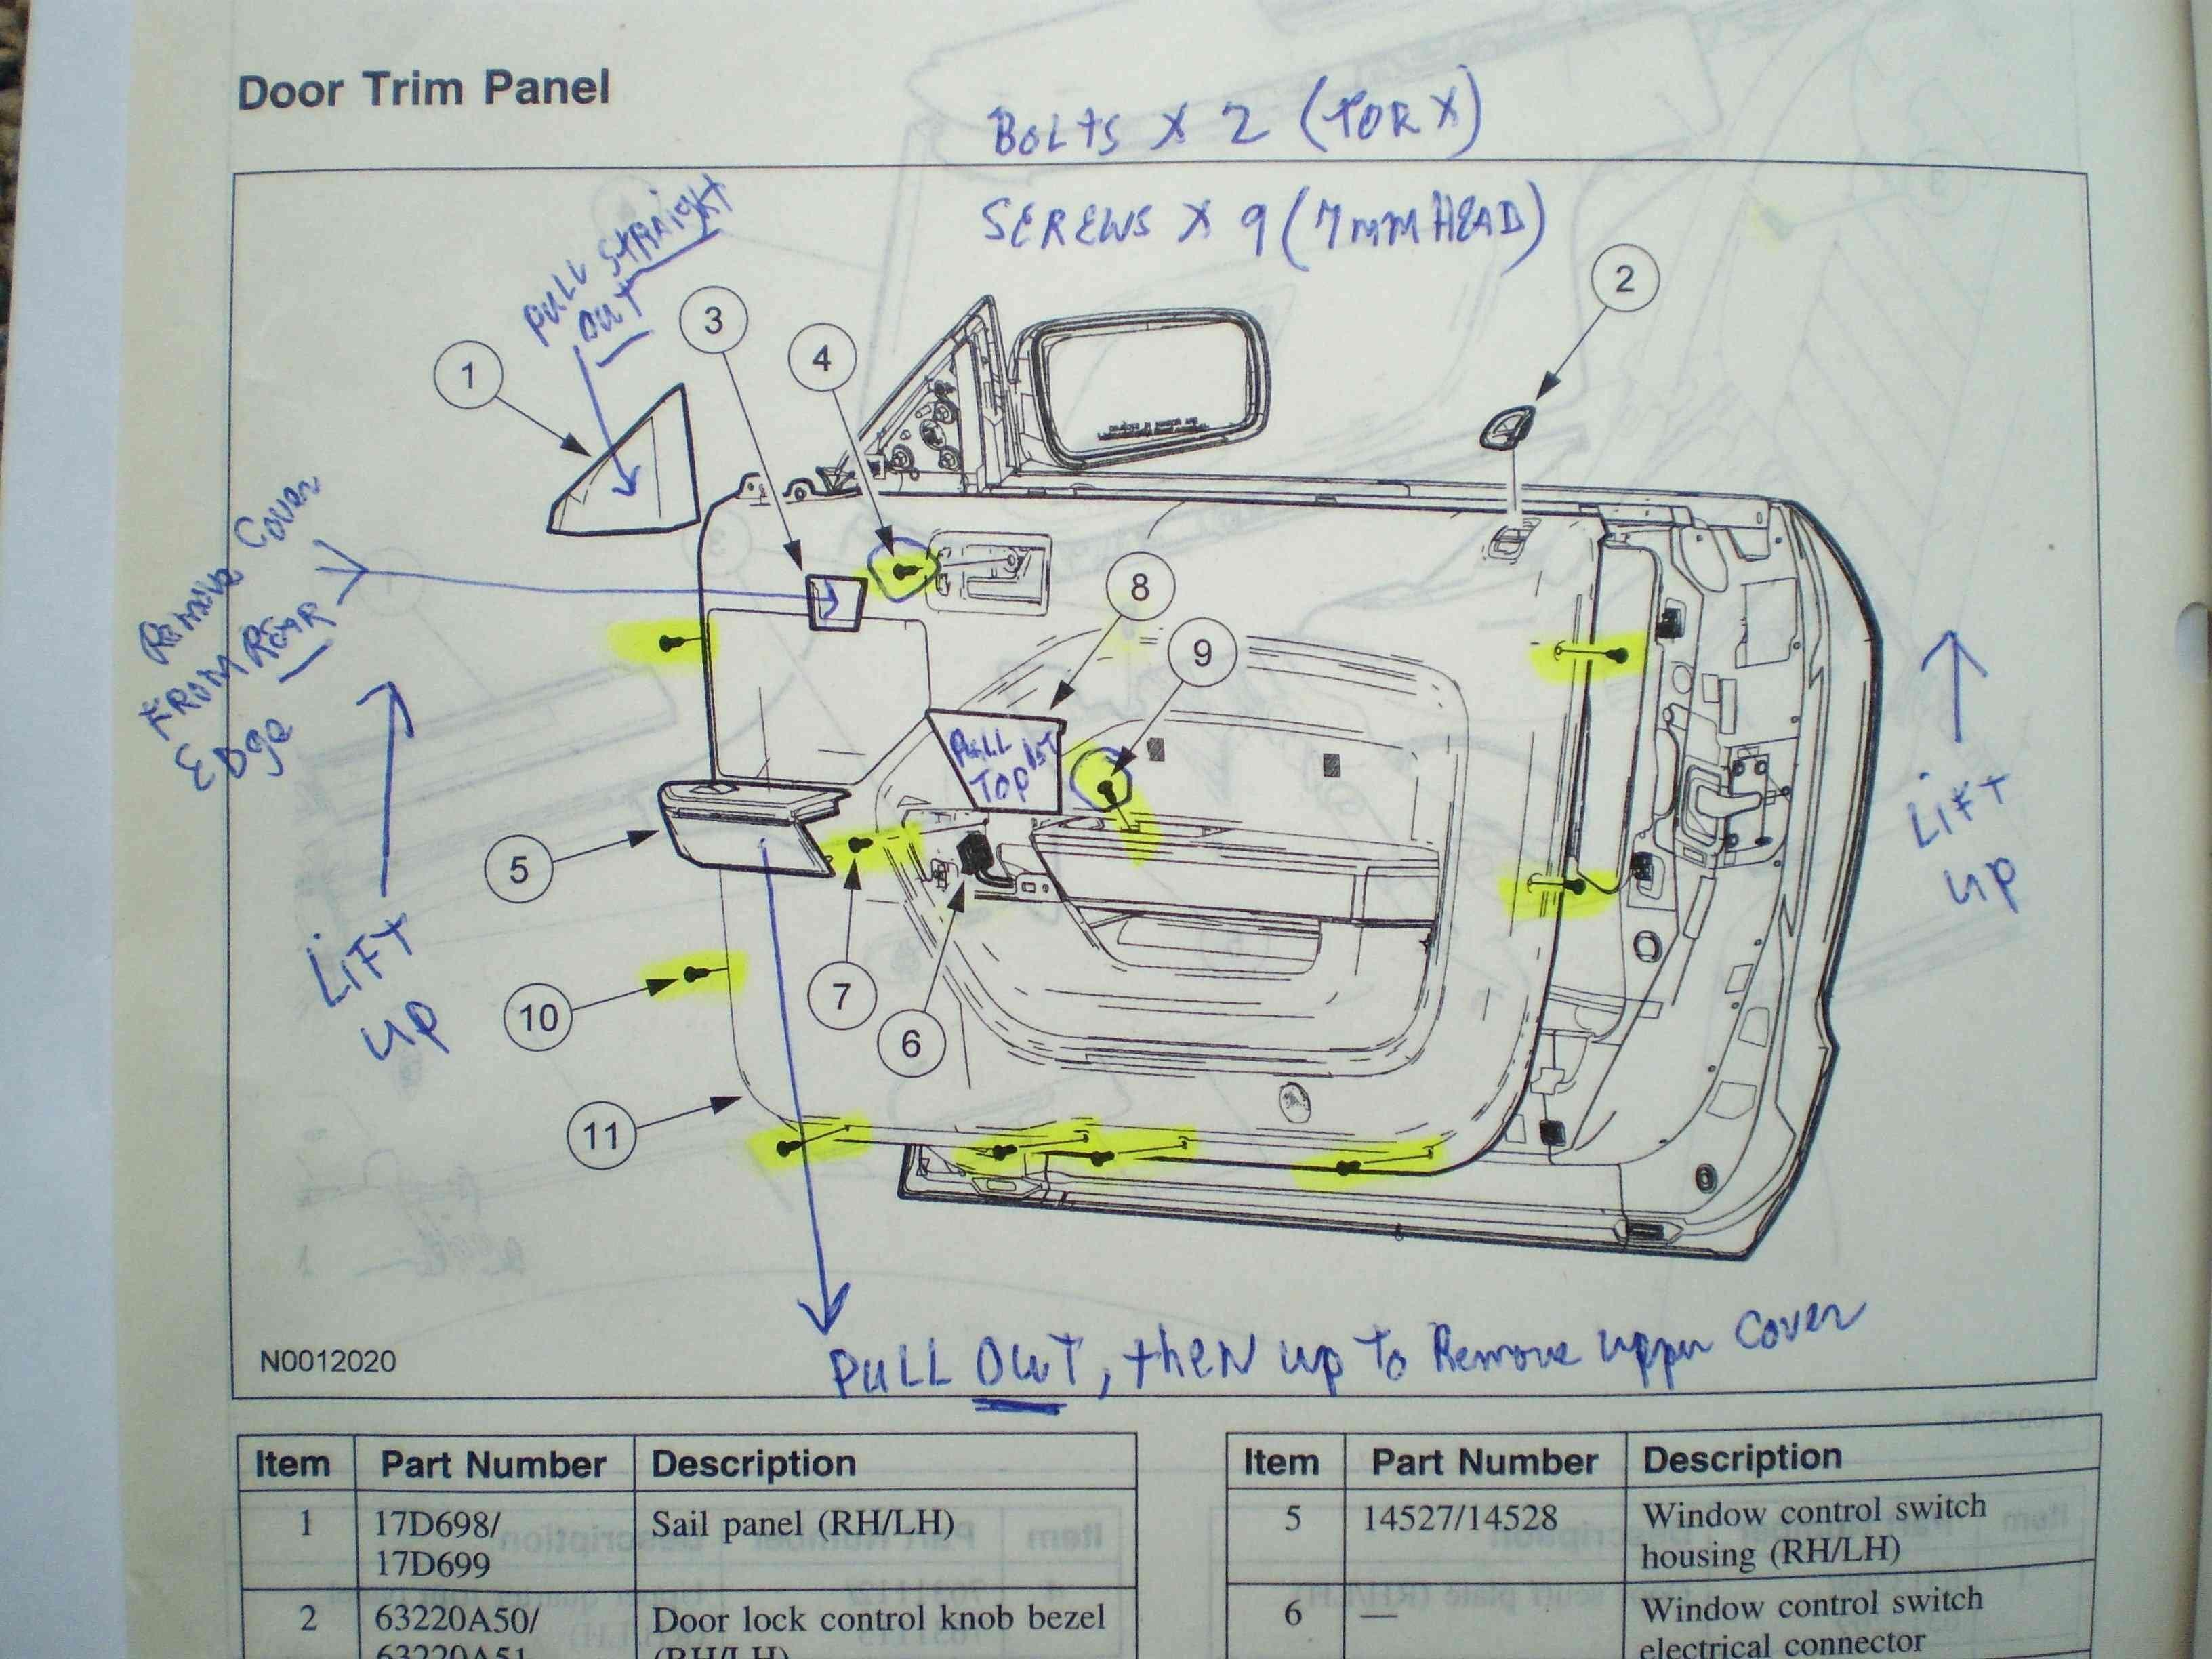 1965 Mustang Door Diagram - Electrical Work Wiring Diagram •